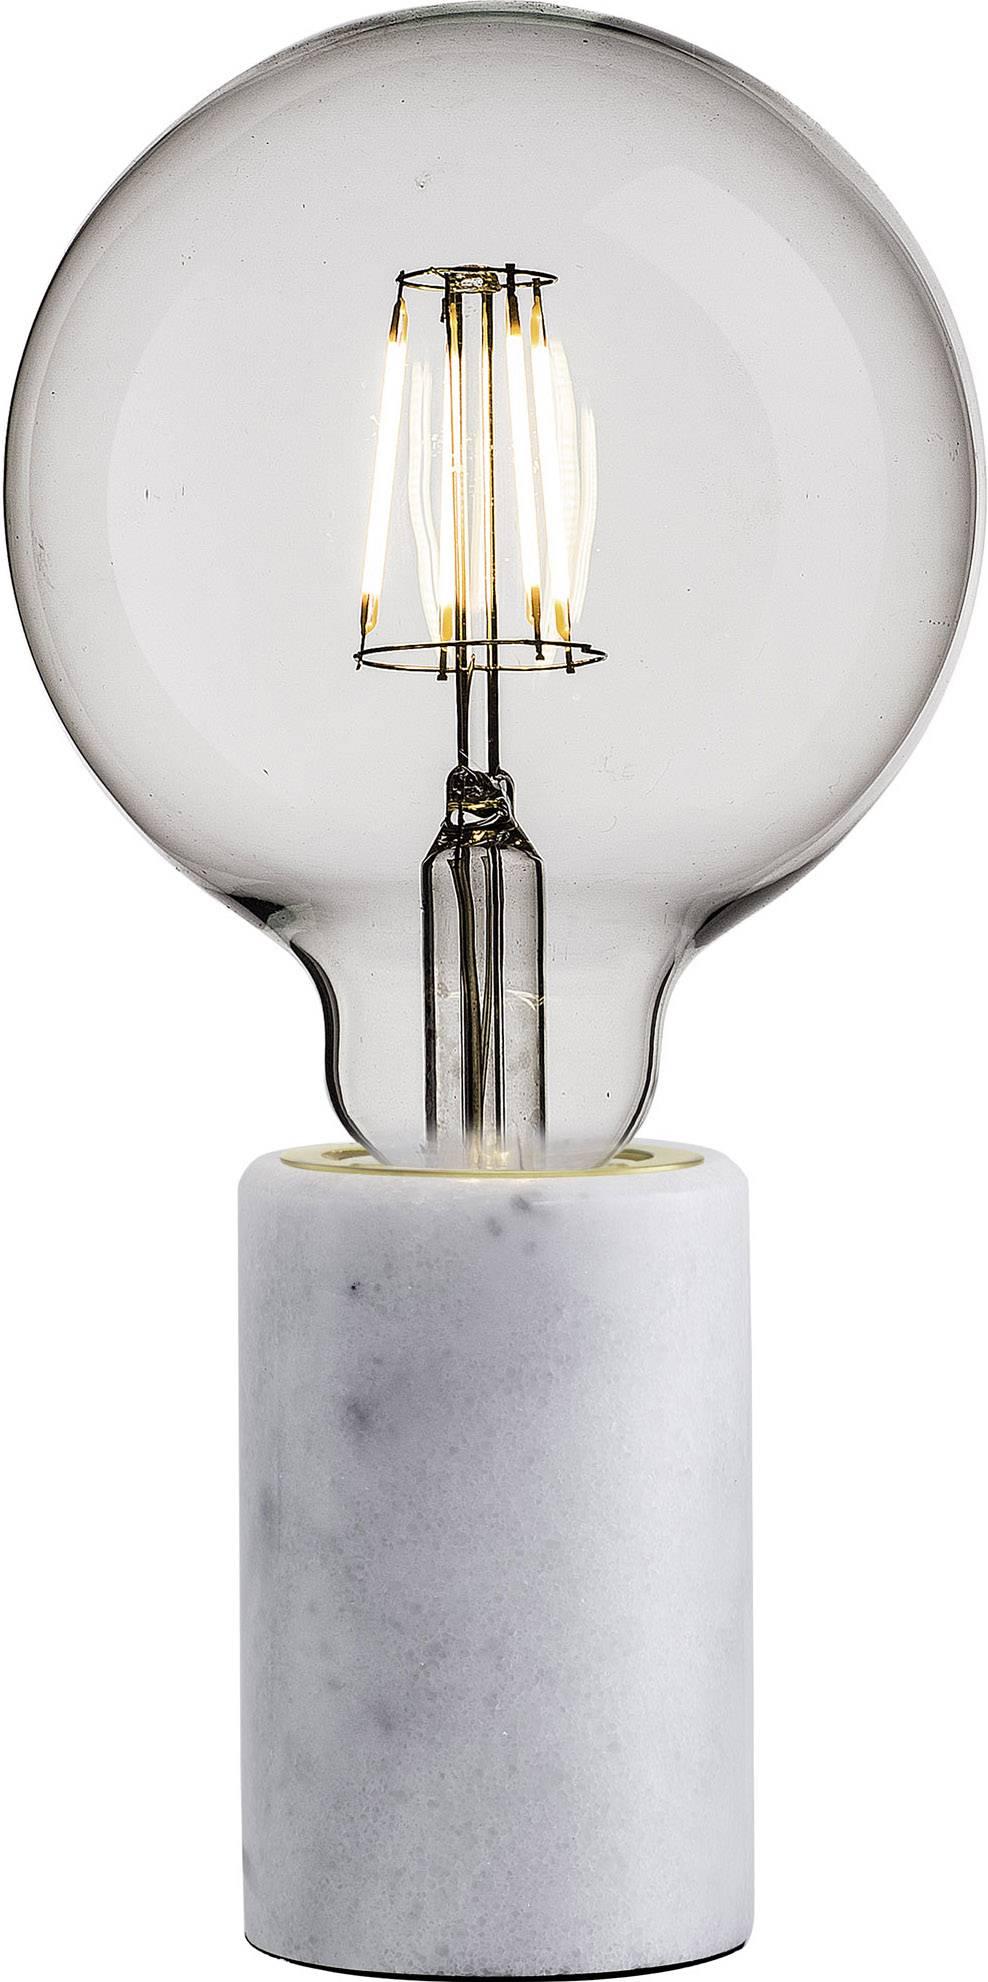 Lampa Stolowa Nordlux 45875001 E27 1 X 40 W 230 V Oxw 6 Cmx10